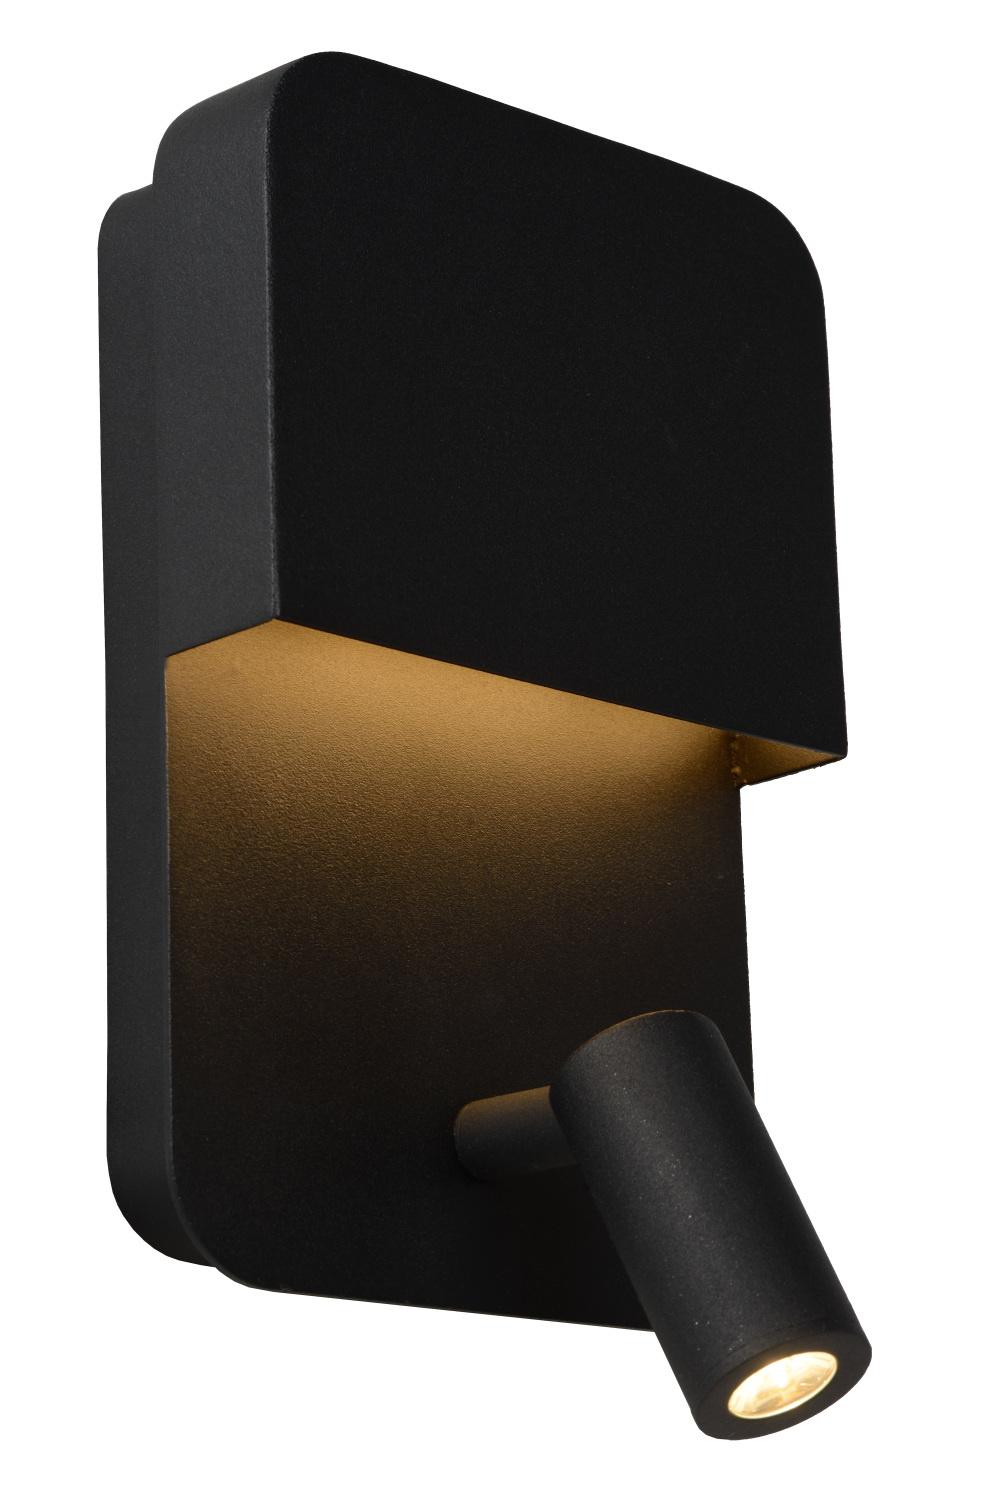 Lucide BOXER Wandlamp-Zwart-LED-10W-3000K